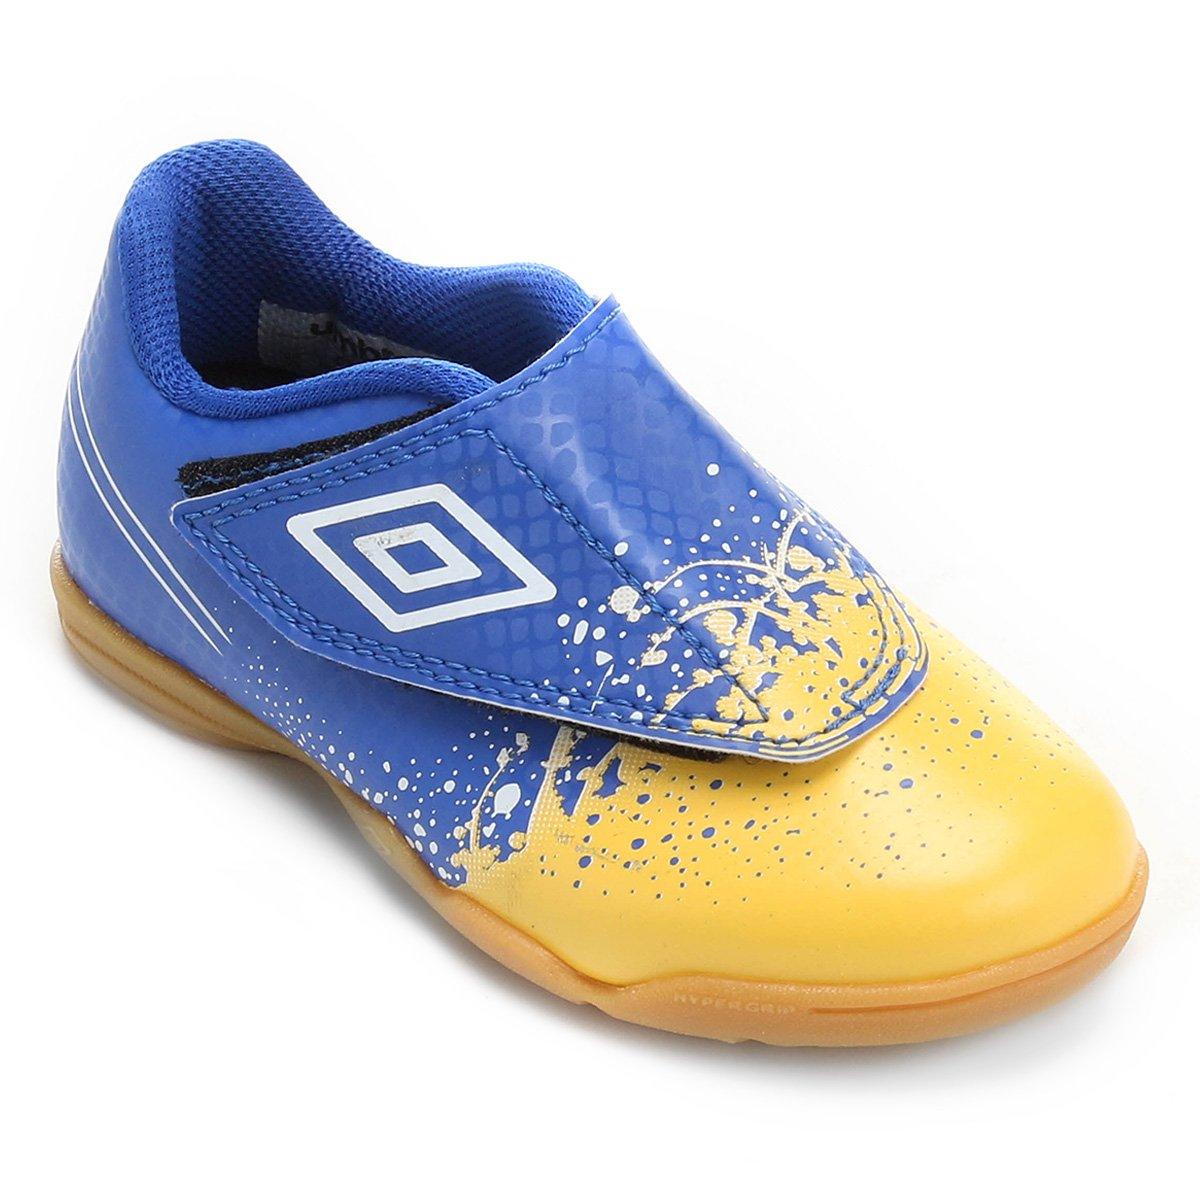 Chuteira Futsal Infantil Umbro Wave - Compre Agora  8fda37173e75f